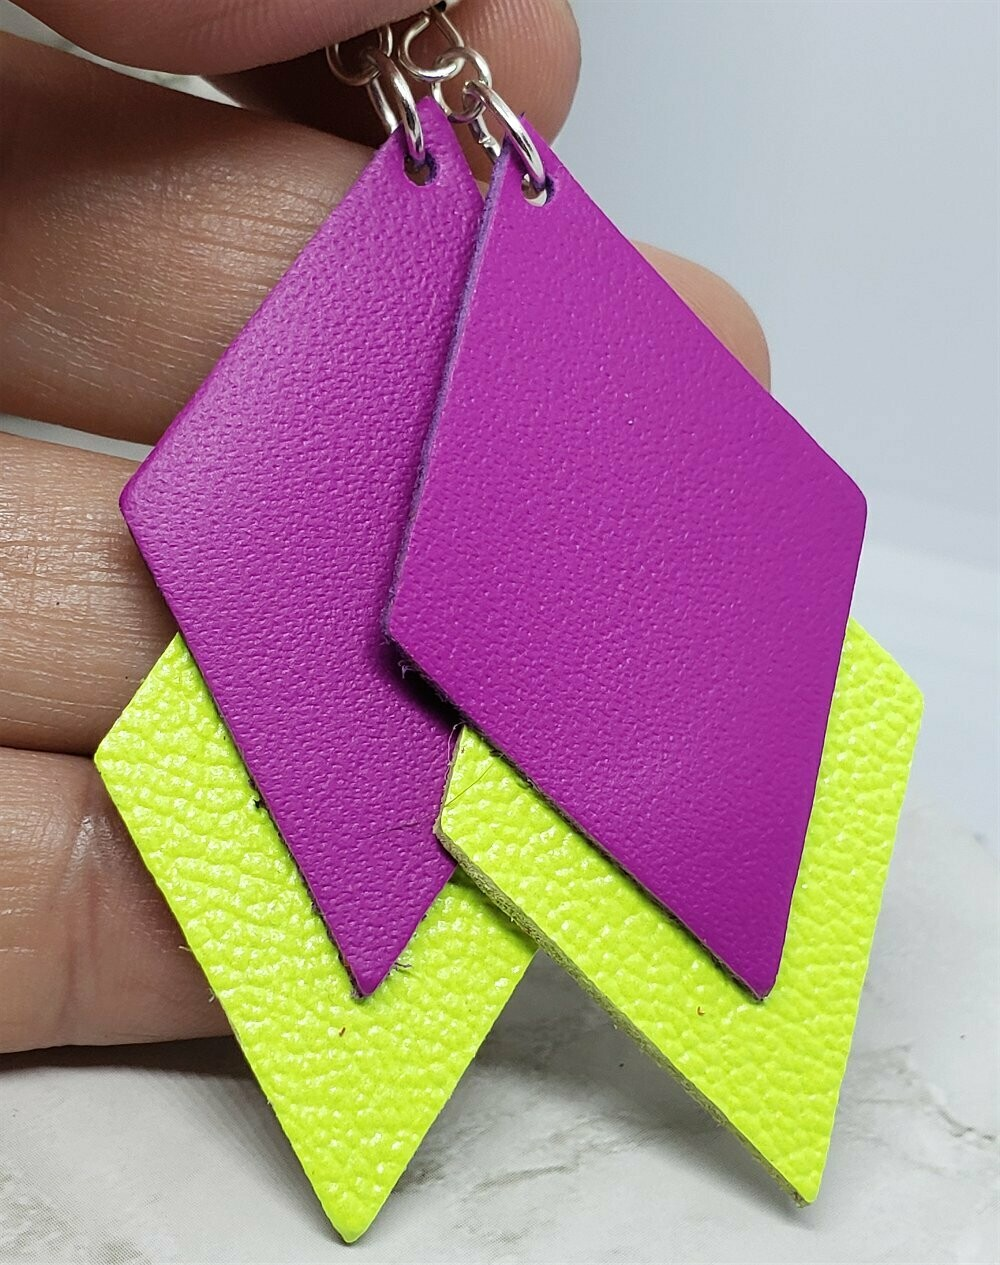 Neon Layered Diamond REAL Leather Earrings